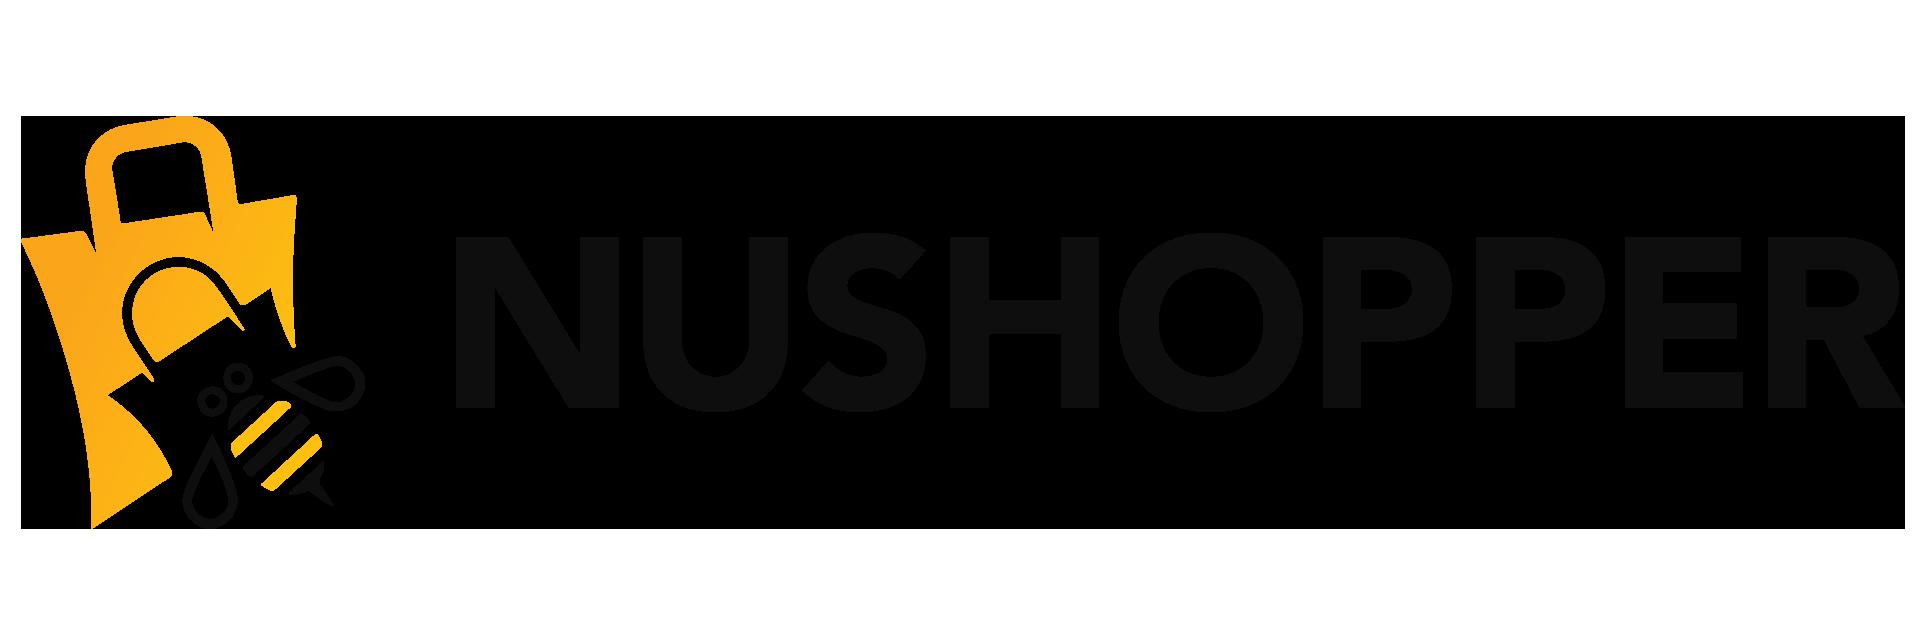 NUSHOPPER  | nushopper.com